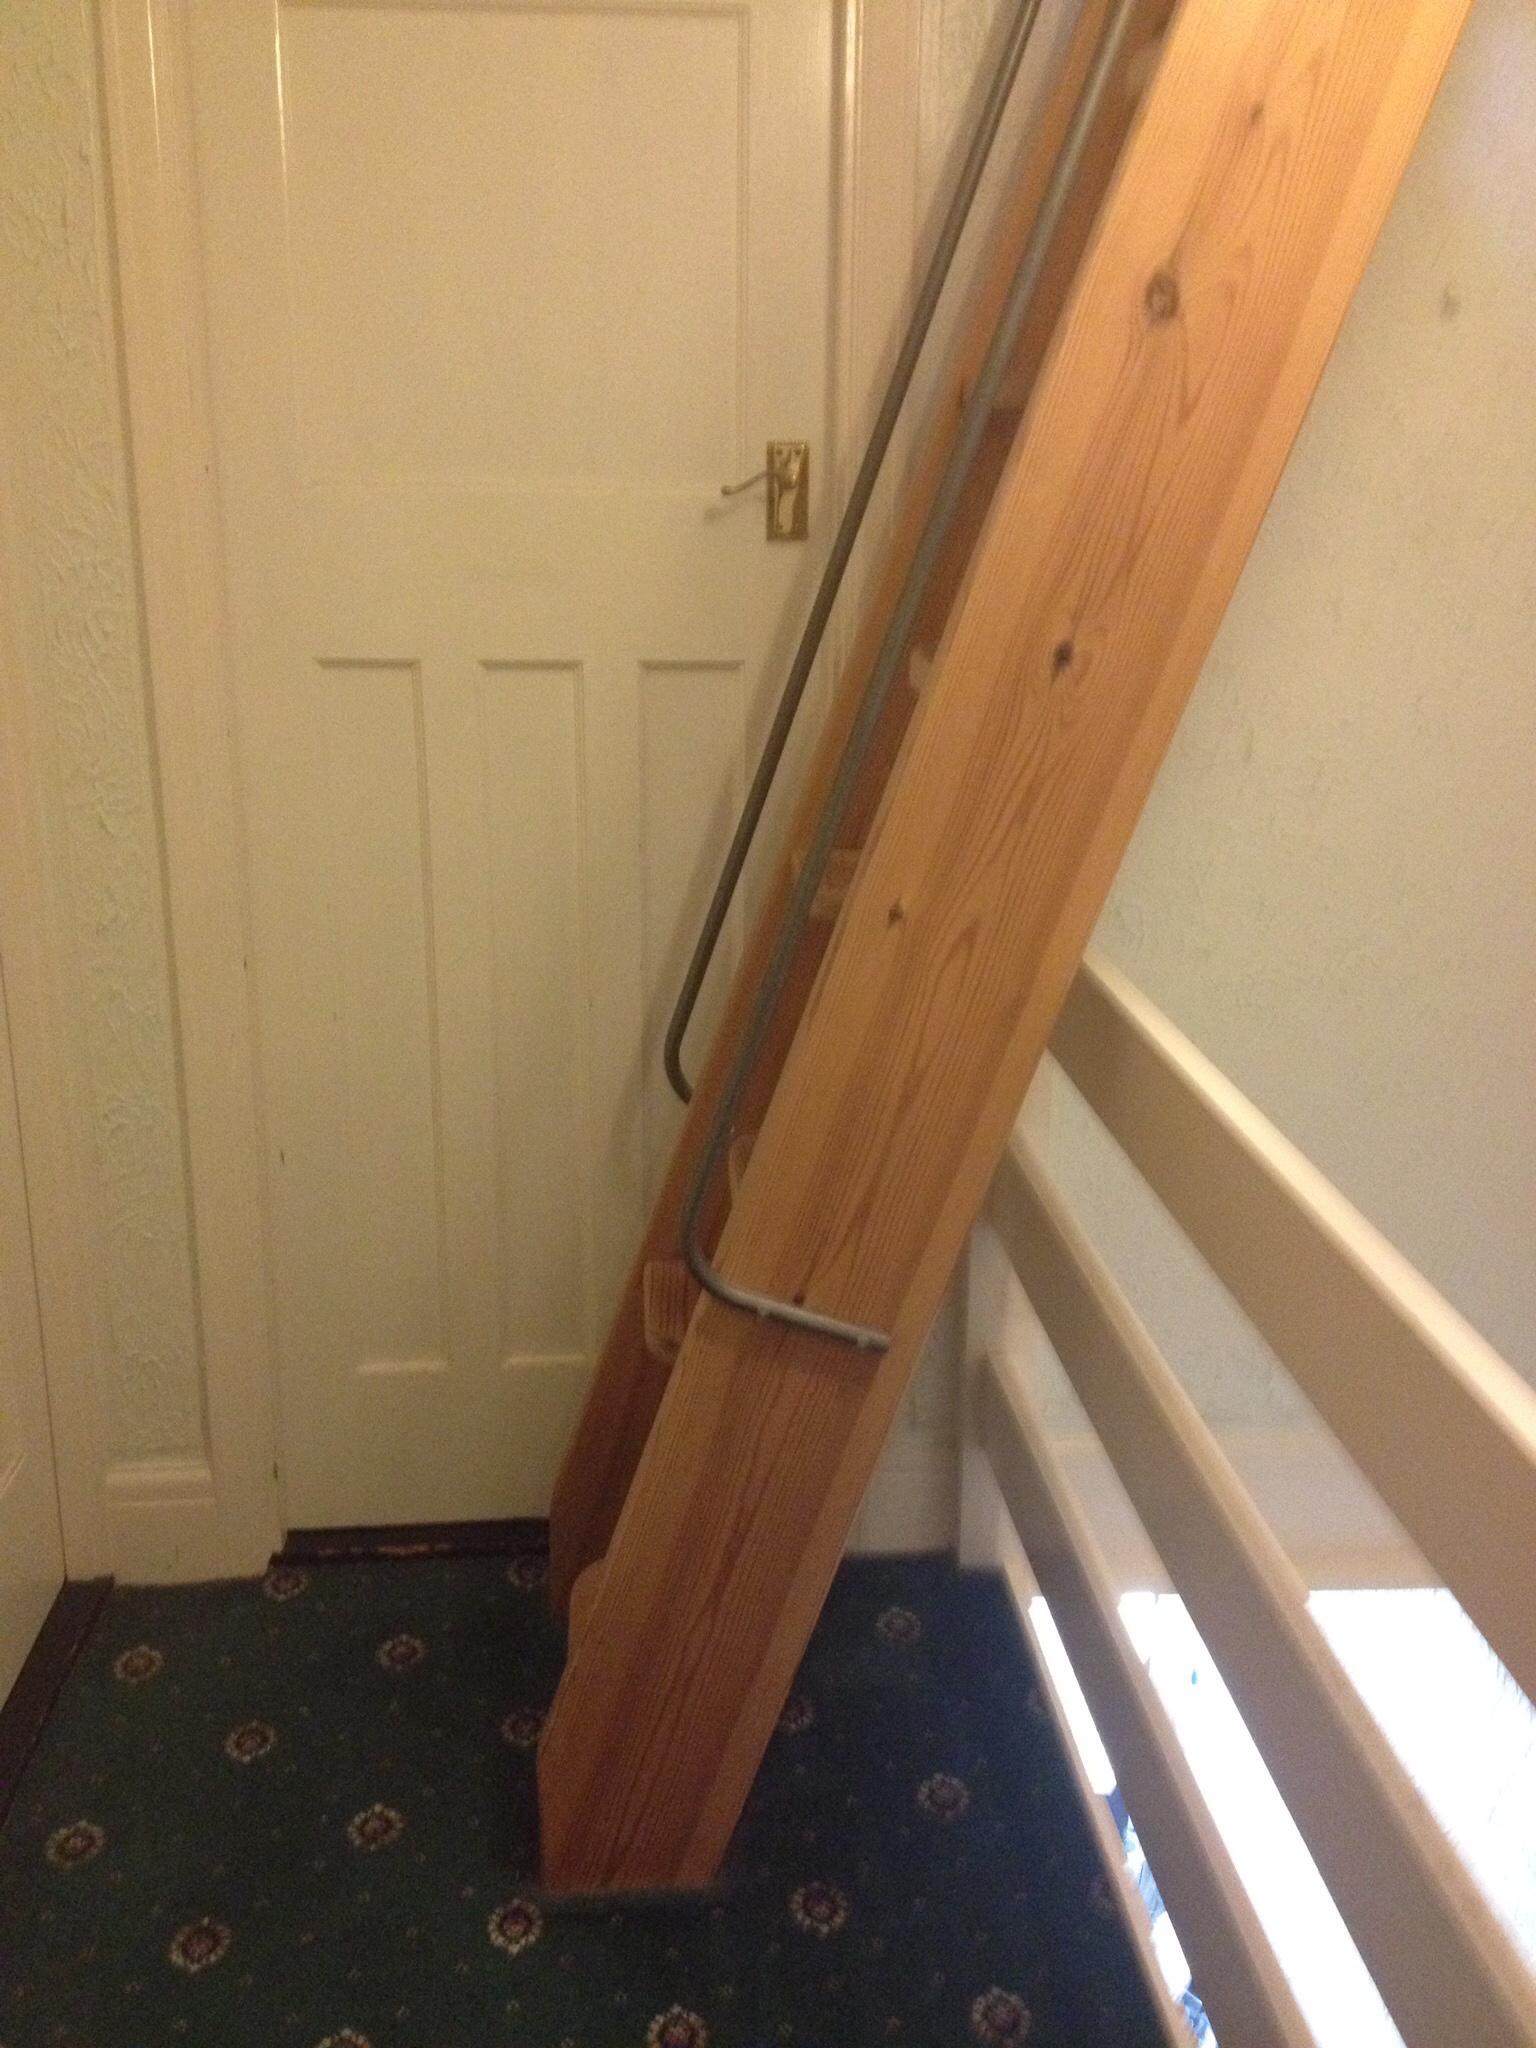 Loft conversion - original ladder